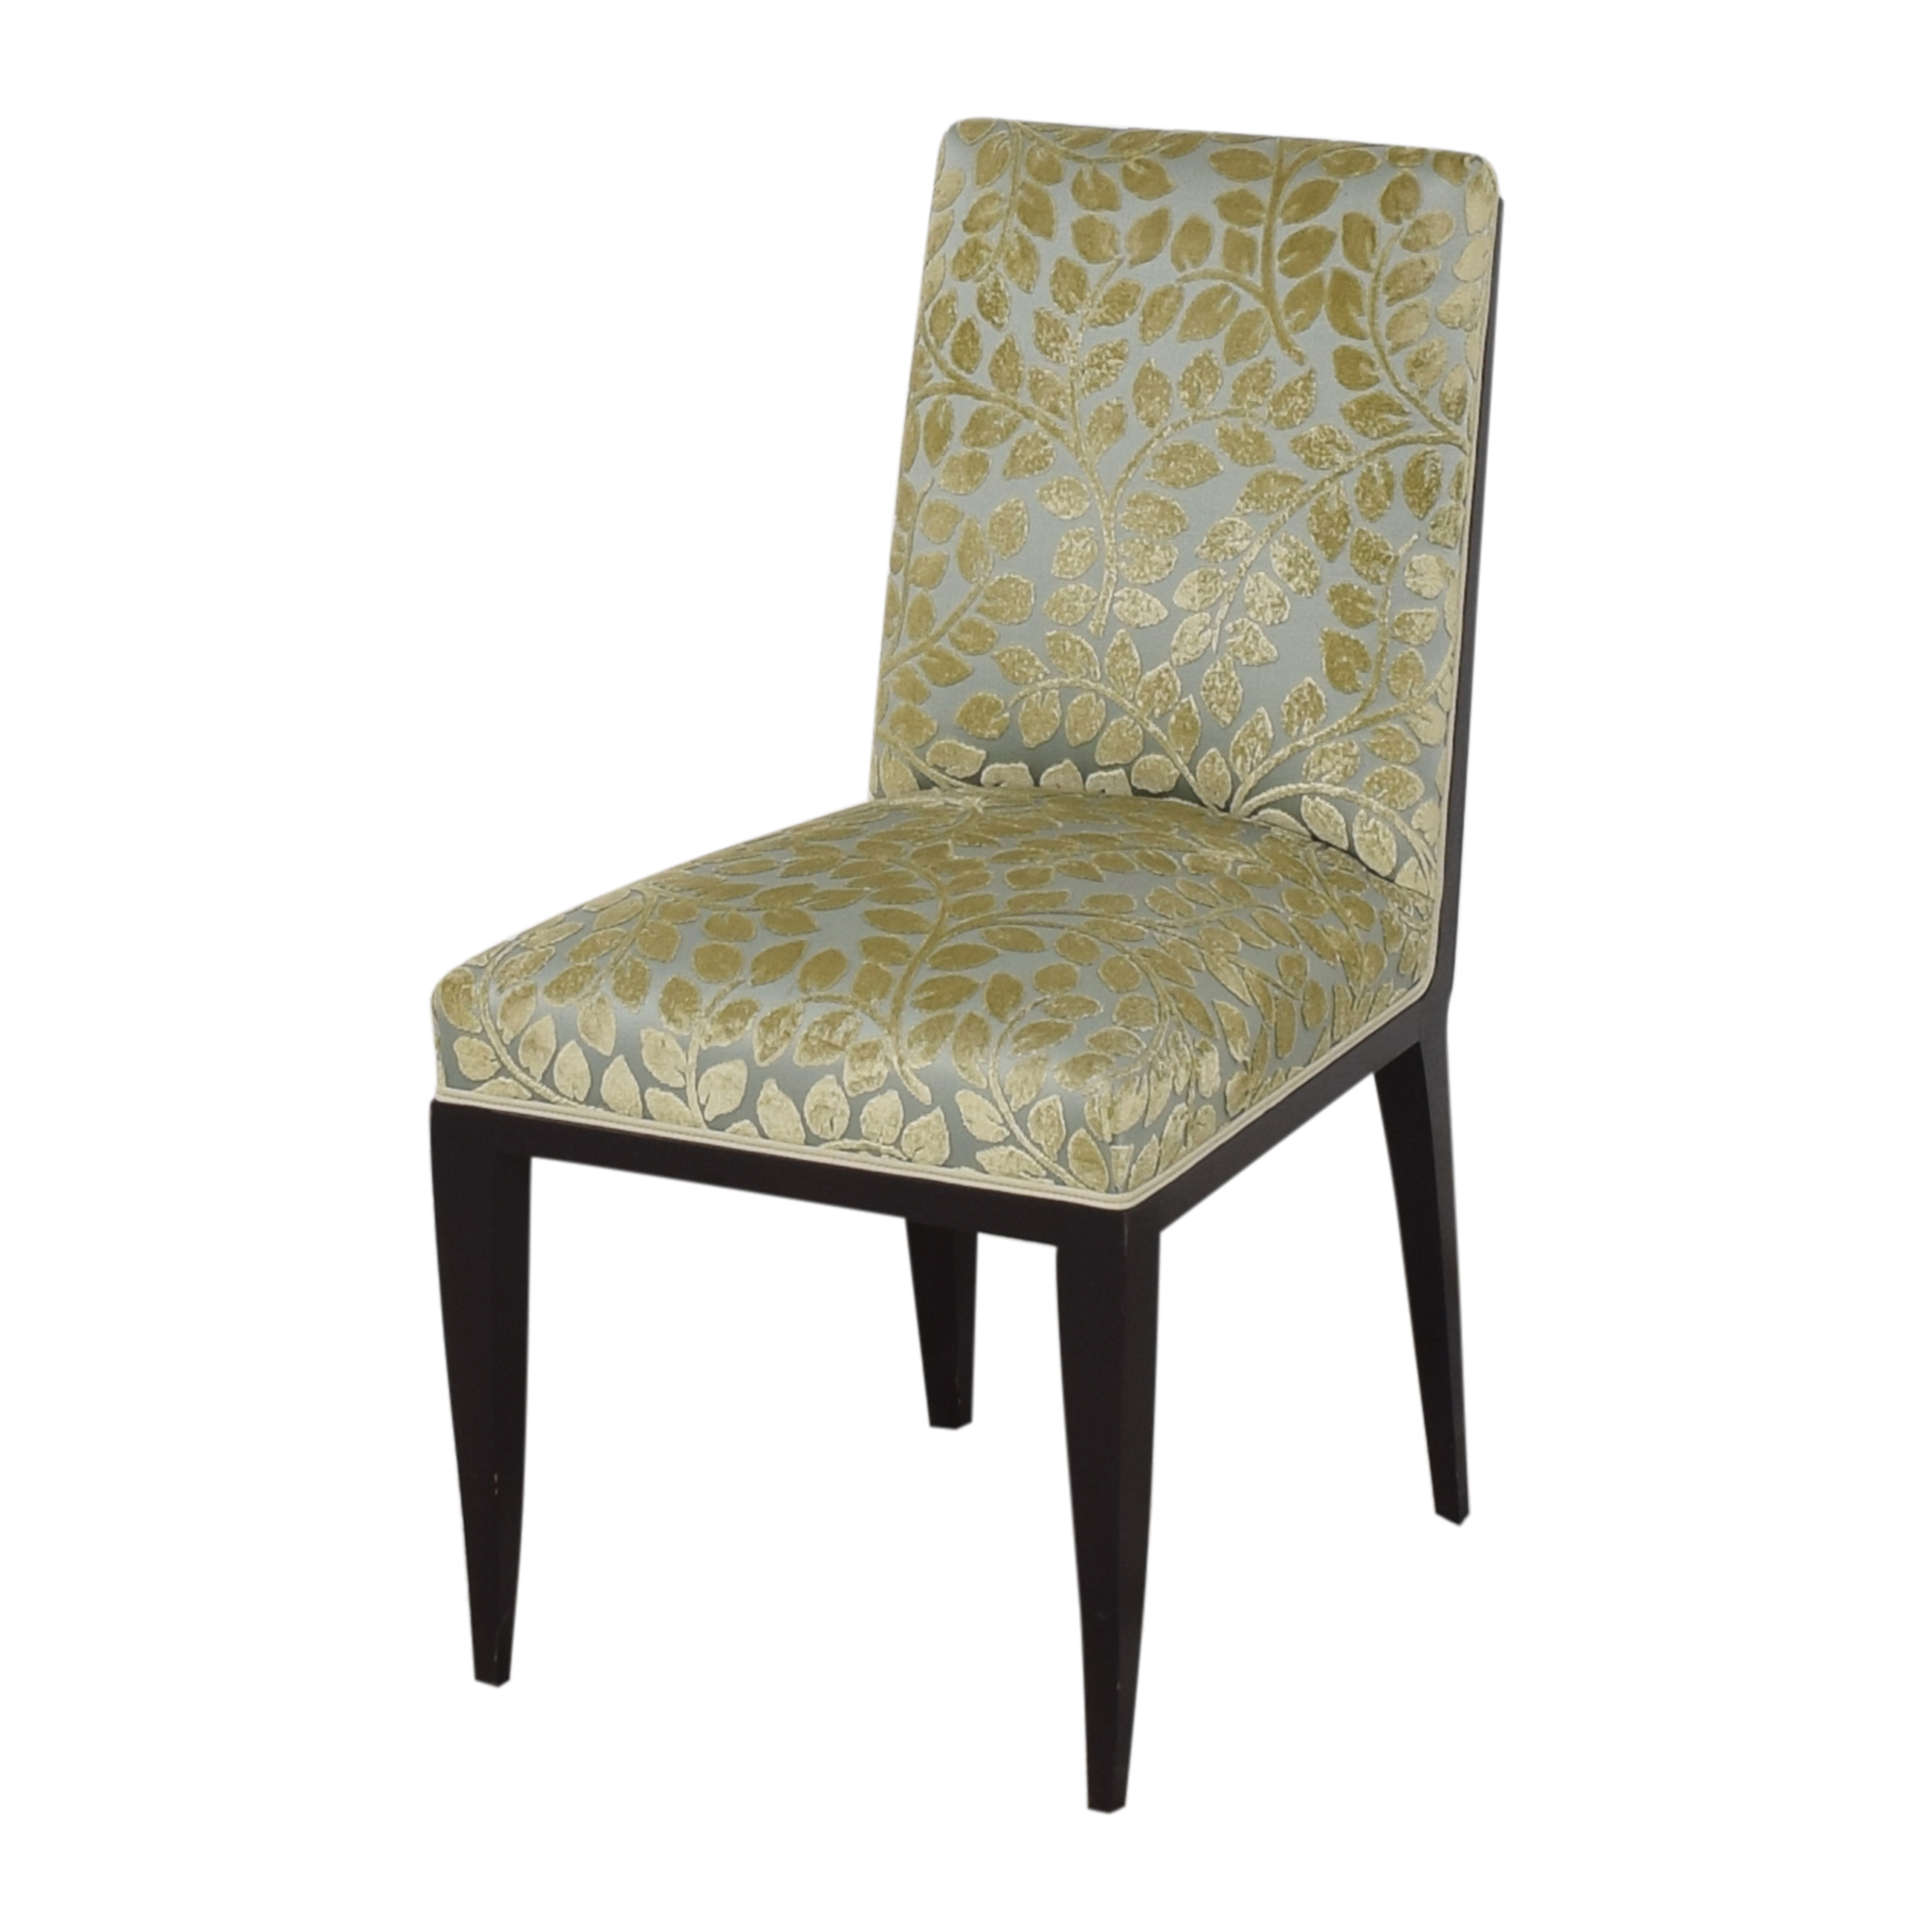 Mattaliano Mattaliano Flea Market #1 Dining Side Chairs coupon